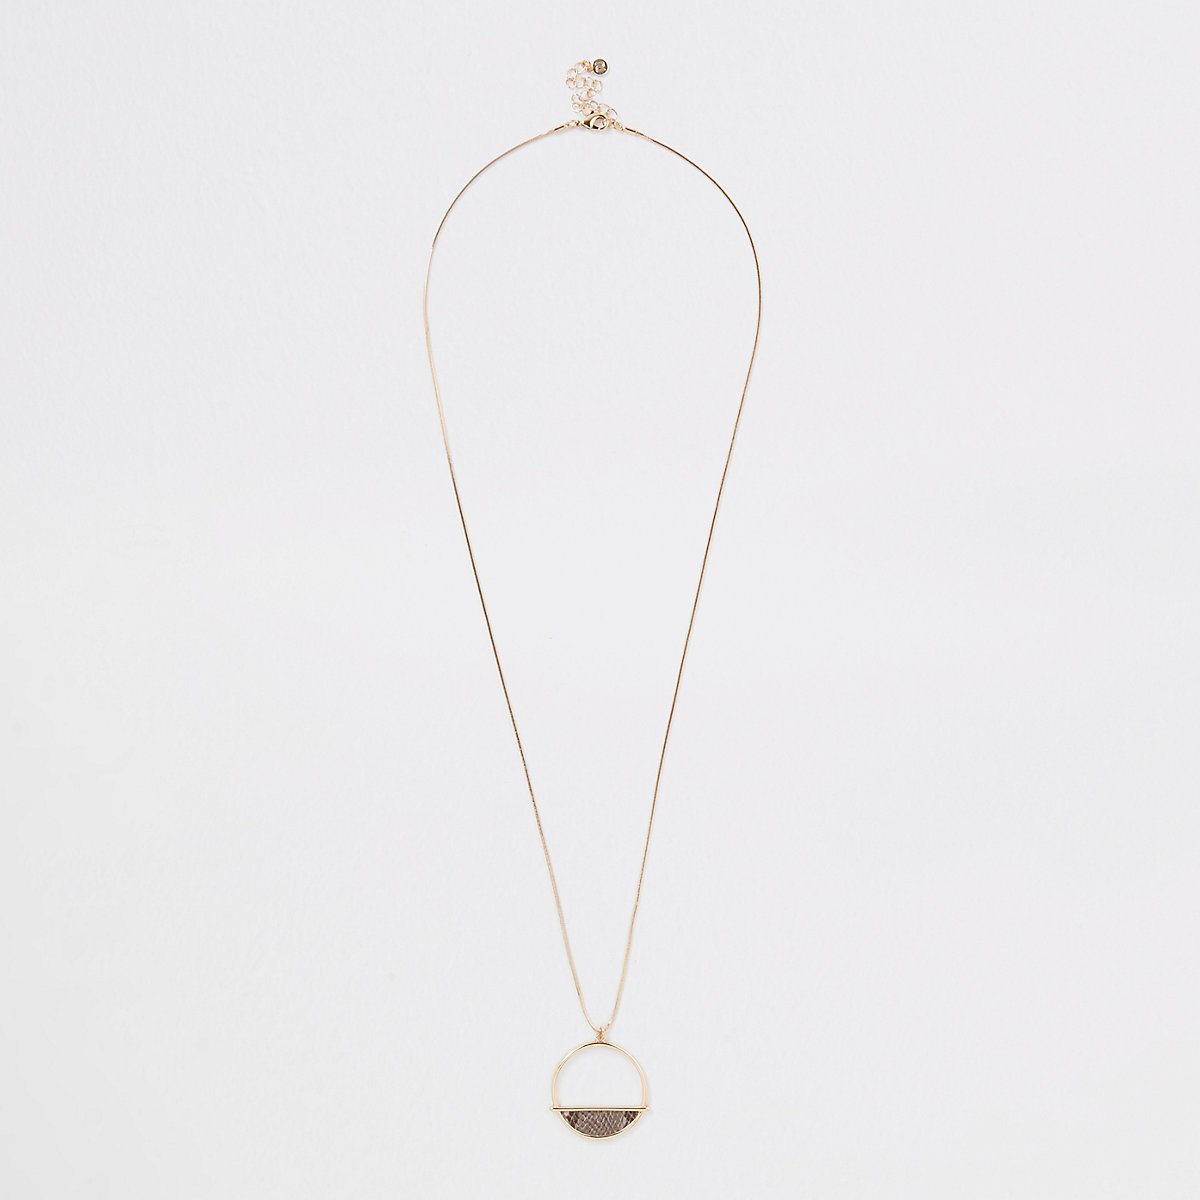 Gold color snake chain long pendant necklace